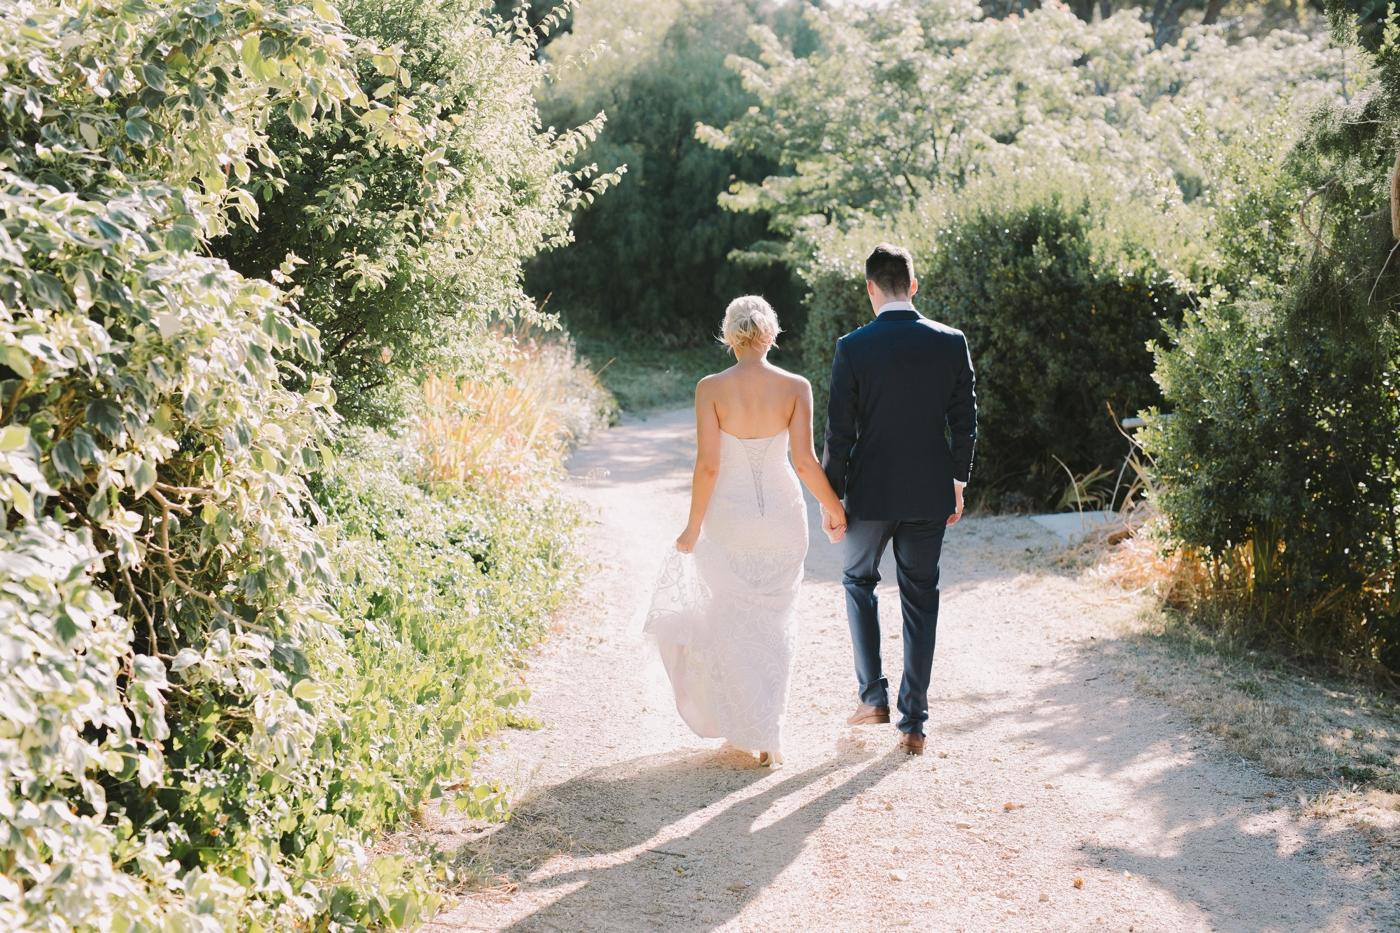 Lauren & Max - Marybank Estate Wedding - Natural wedding photographer in Adelaide - www.katherineschultzphotography.com 74